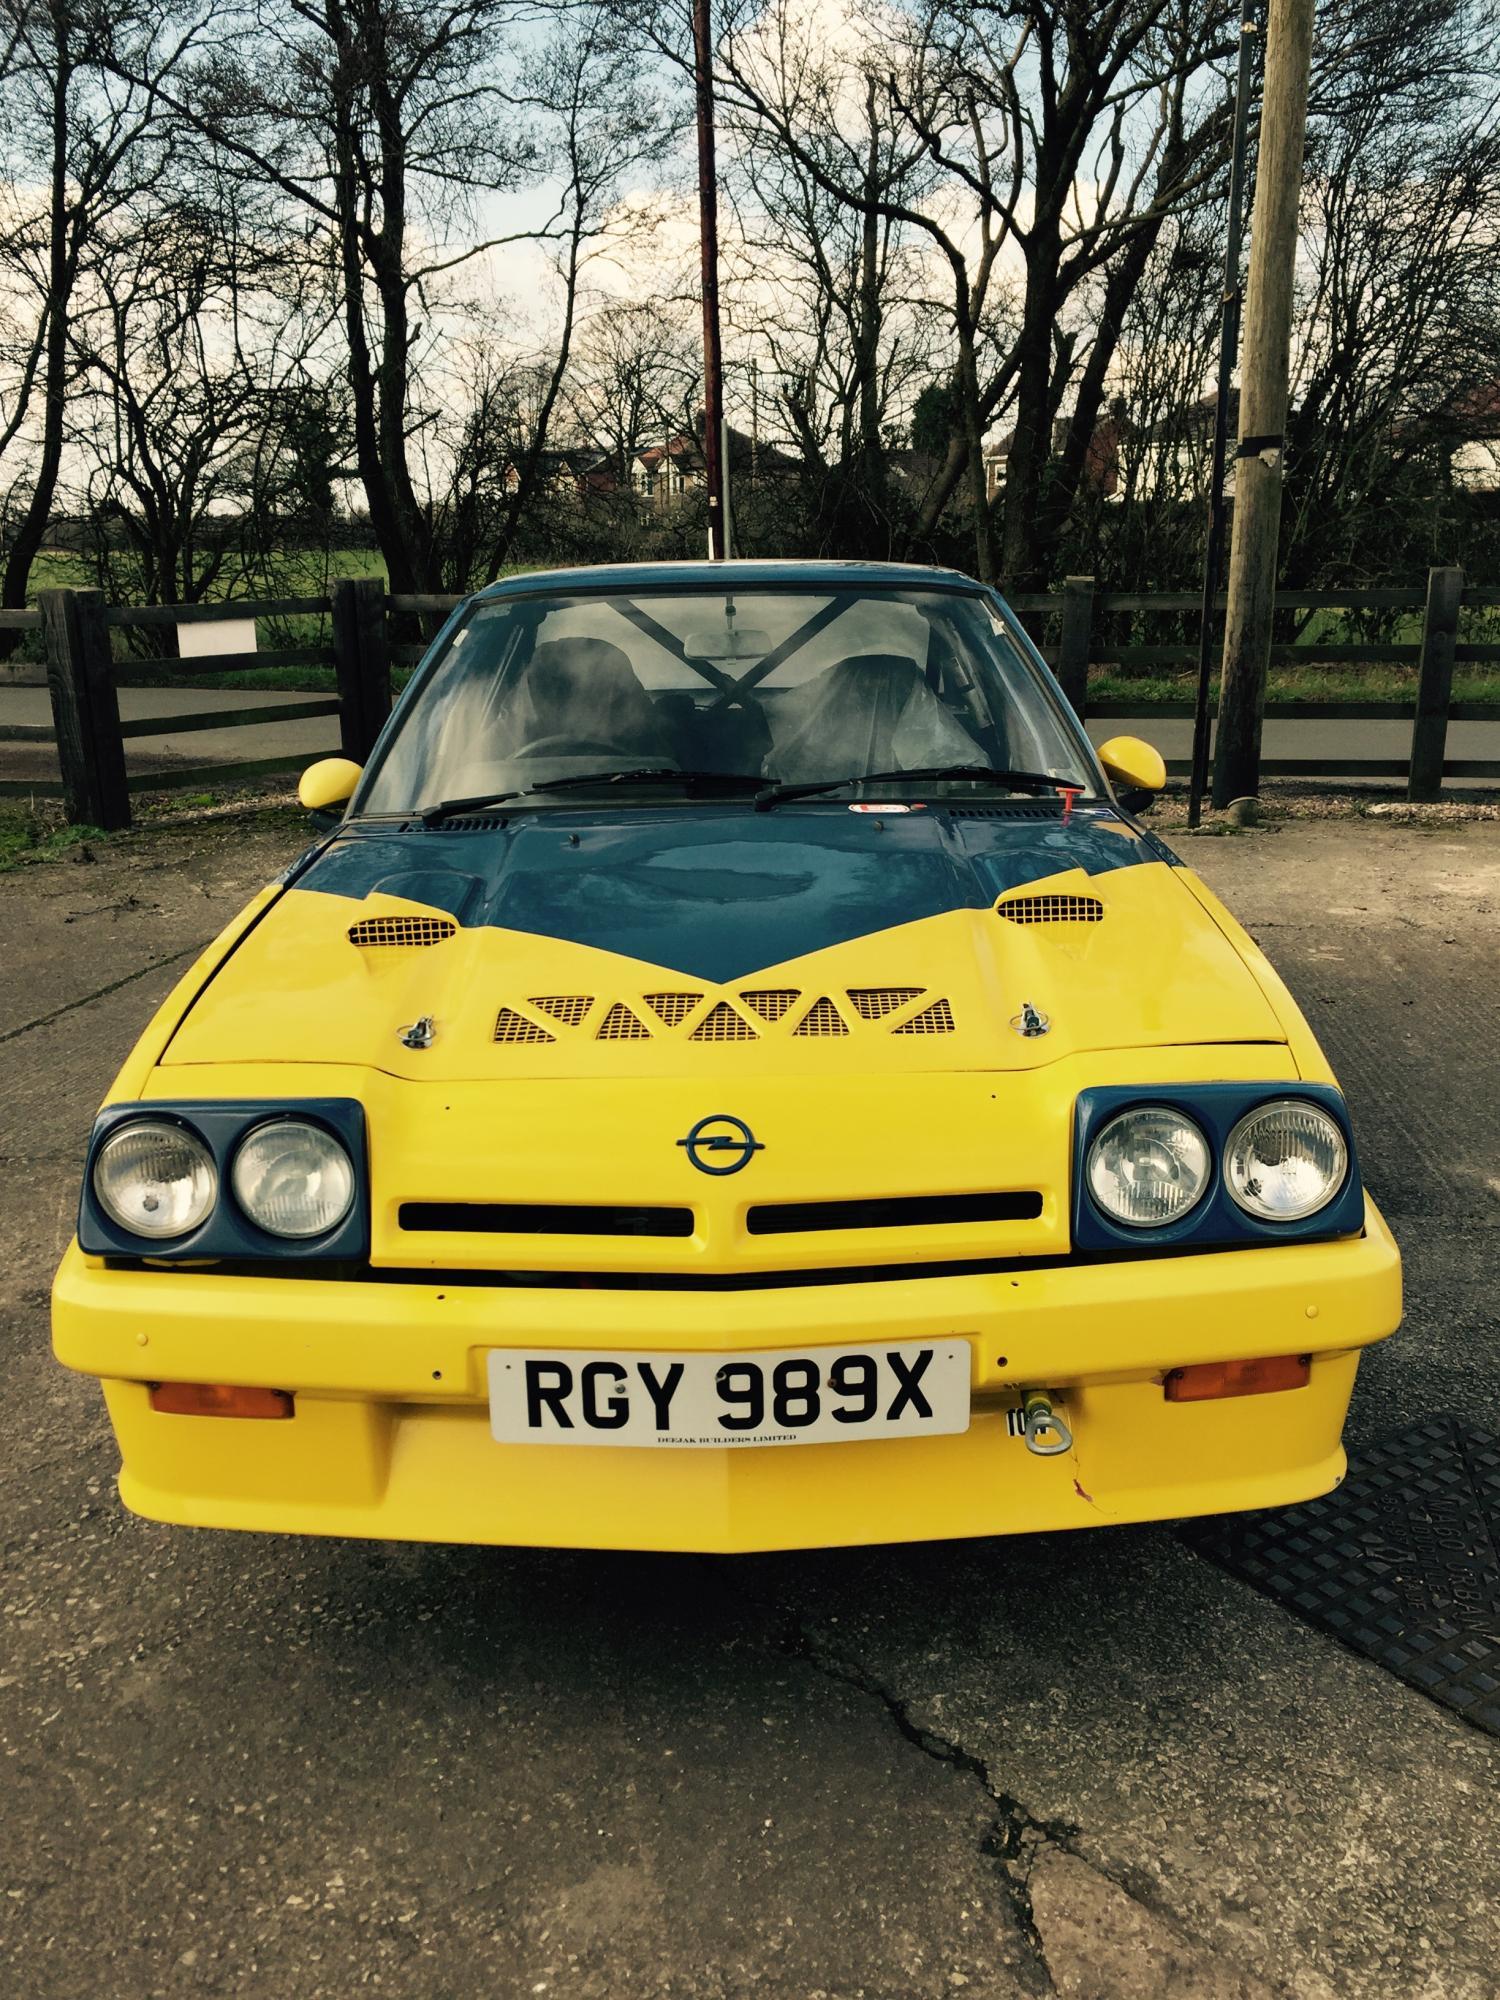 Listing All Cars >> Opel Manta GTE 1981 Rally Car - Cars For Sale - Opel Manta ...